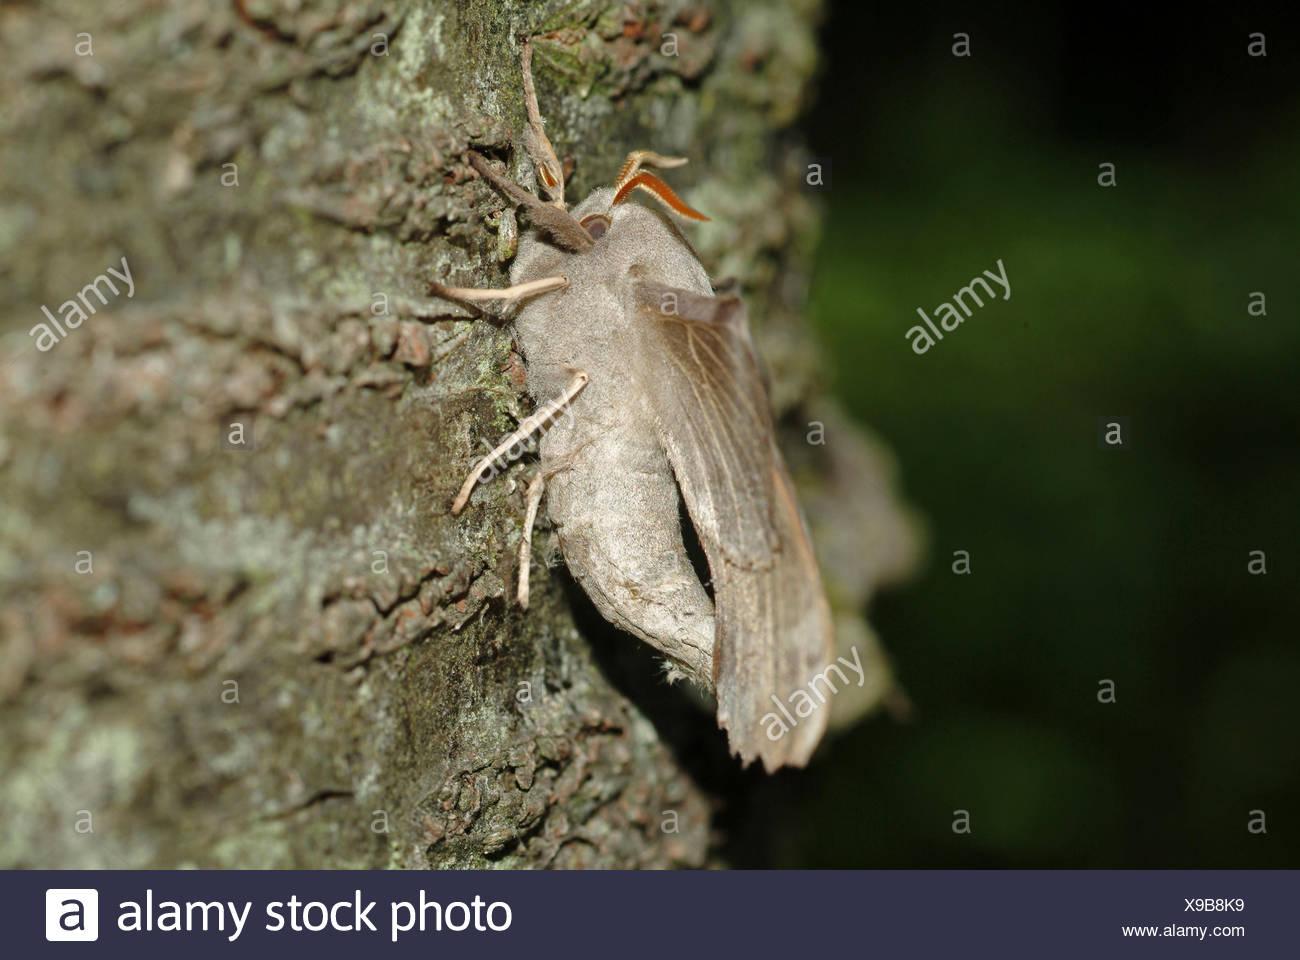 Poplar Hawkmoth (Laothoe populi), sitting on bark, Germany - Stock Image